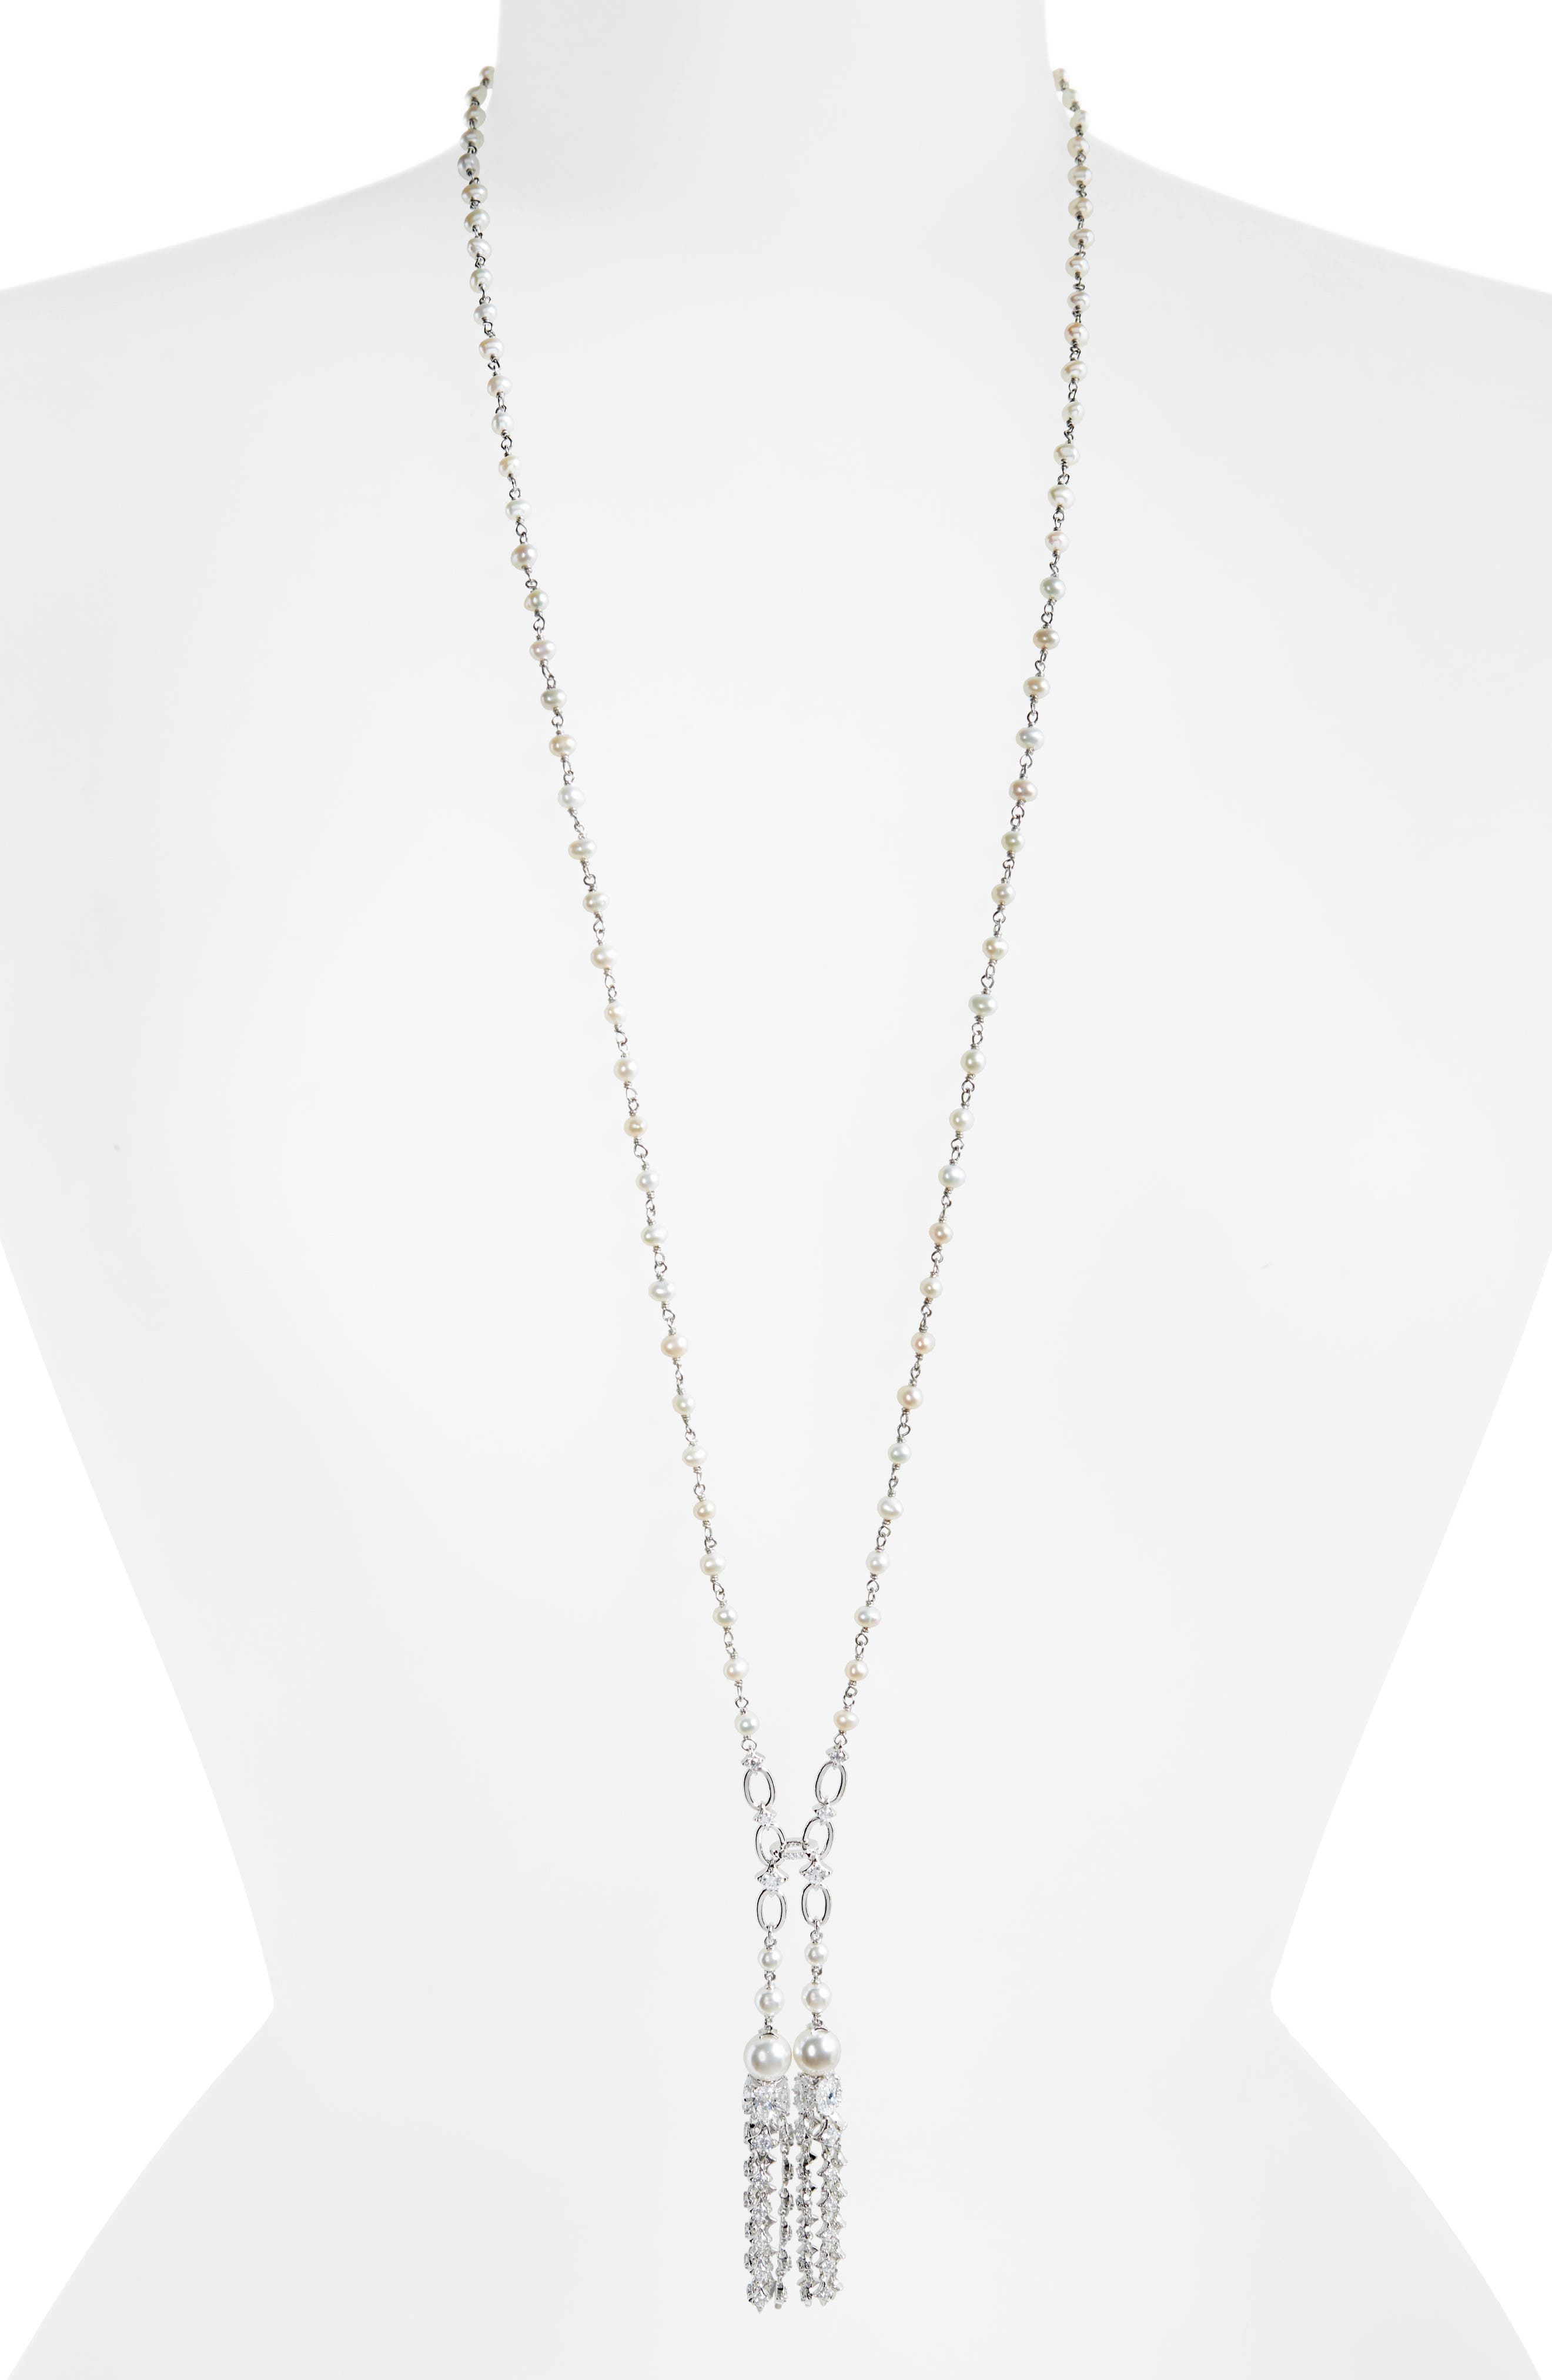 Pearl Tassel Necklace,                         Main,                         color, Silver/ White Pearl